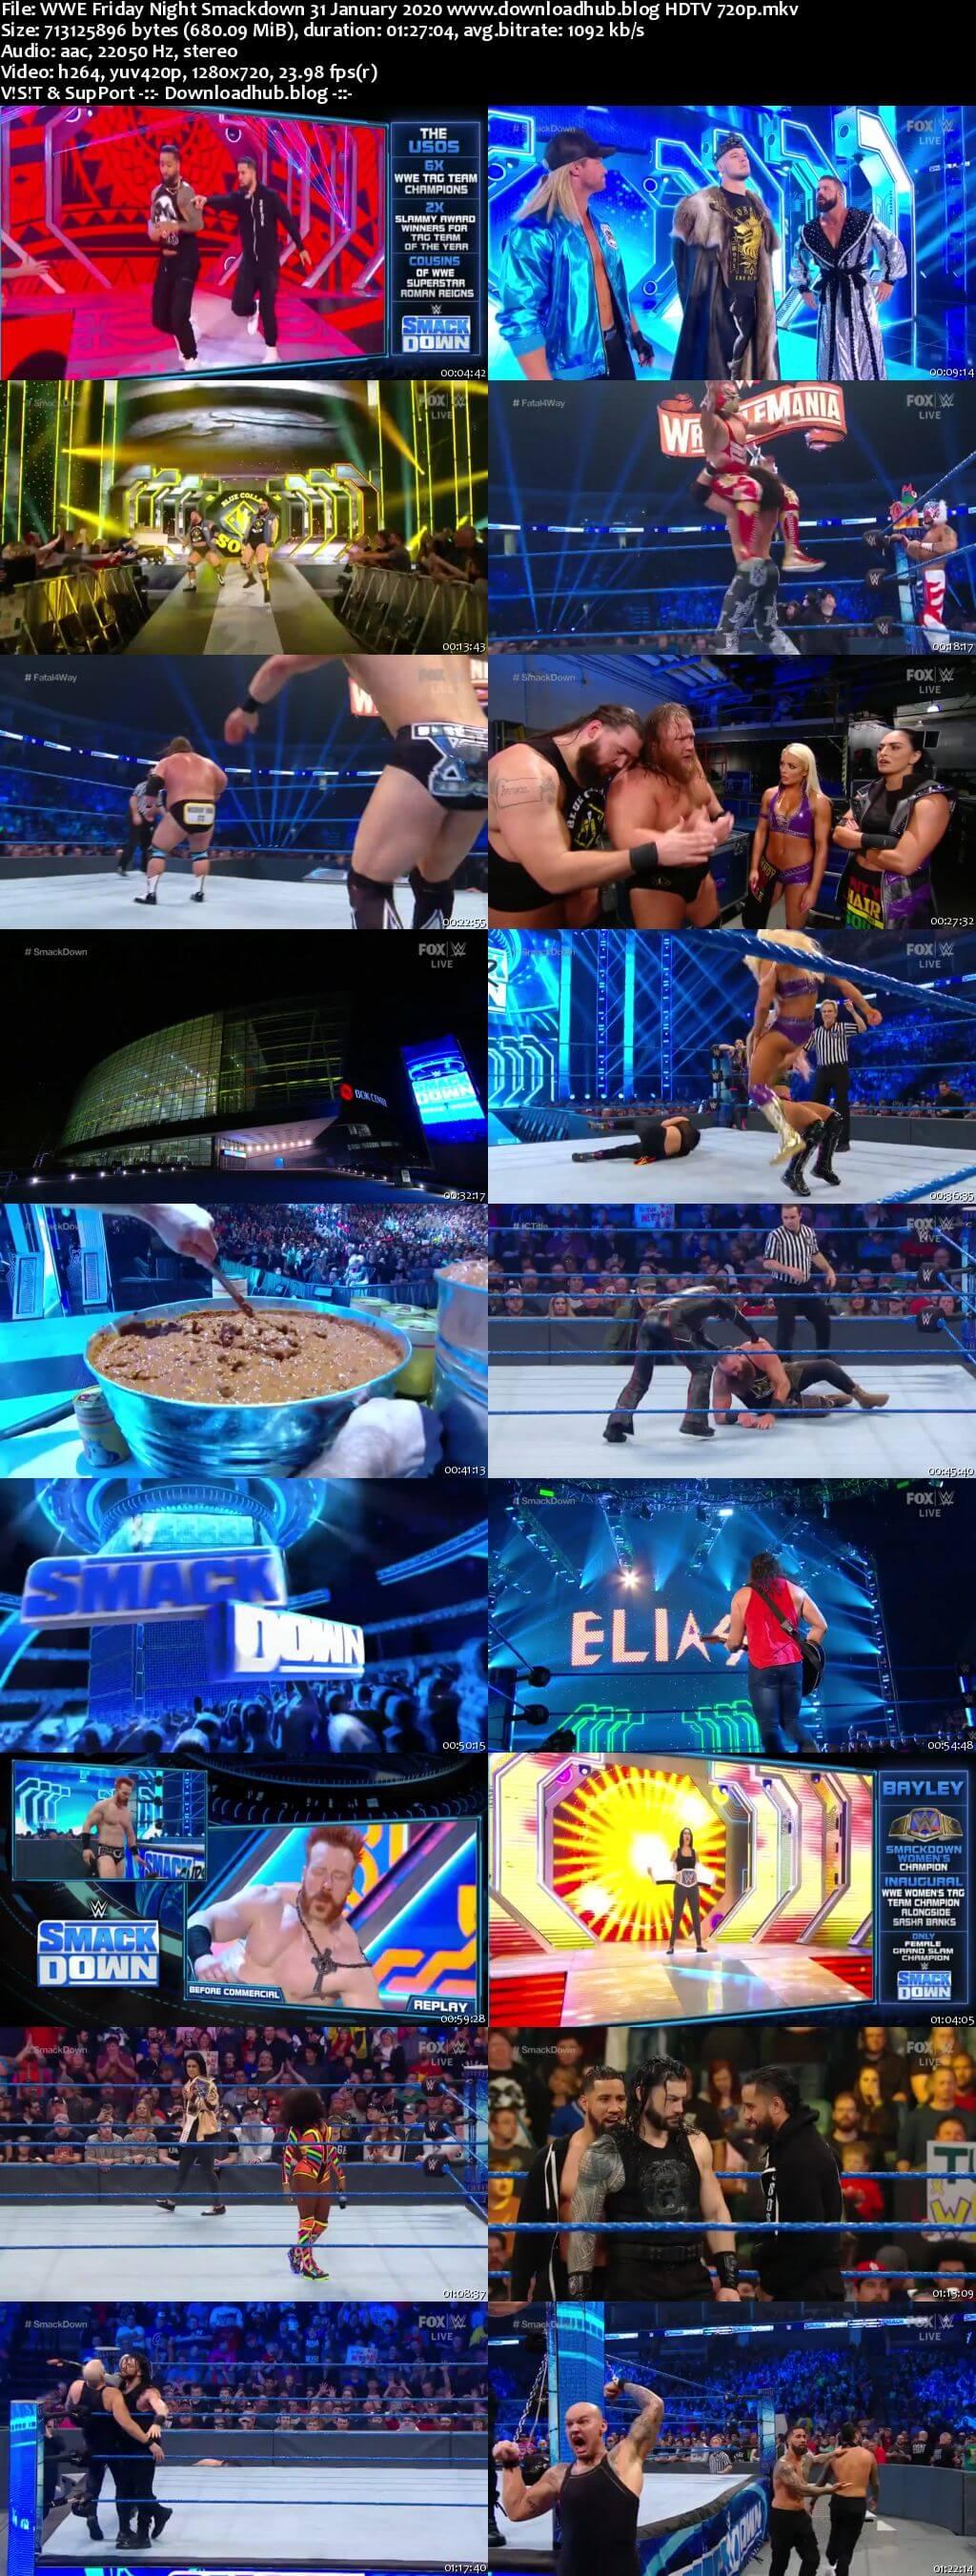 WWE Friday Night Smackdown 31st January 2020 720p 300MB HDTV 480p